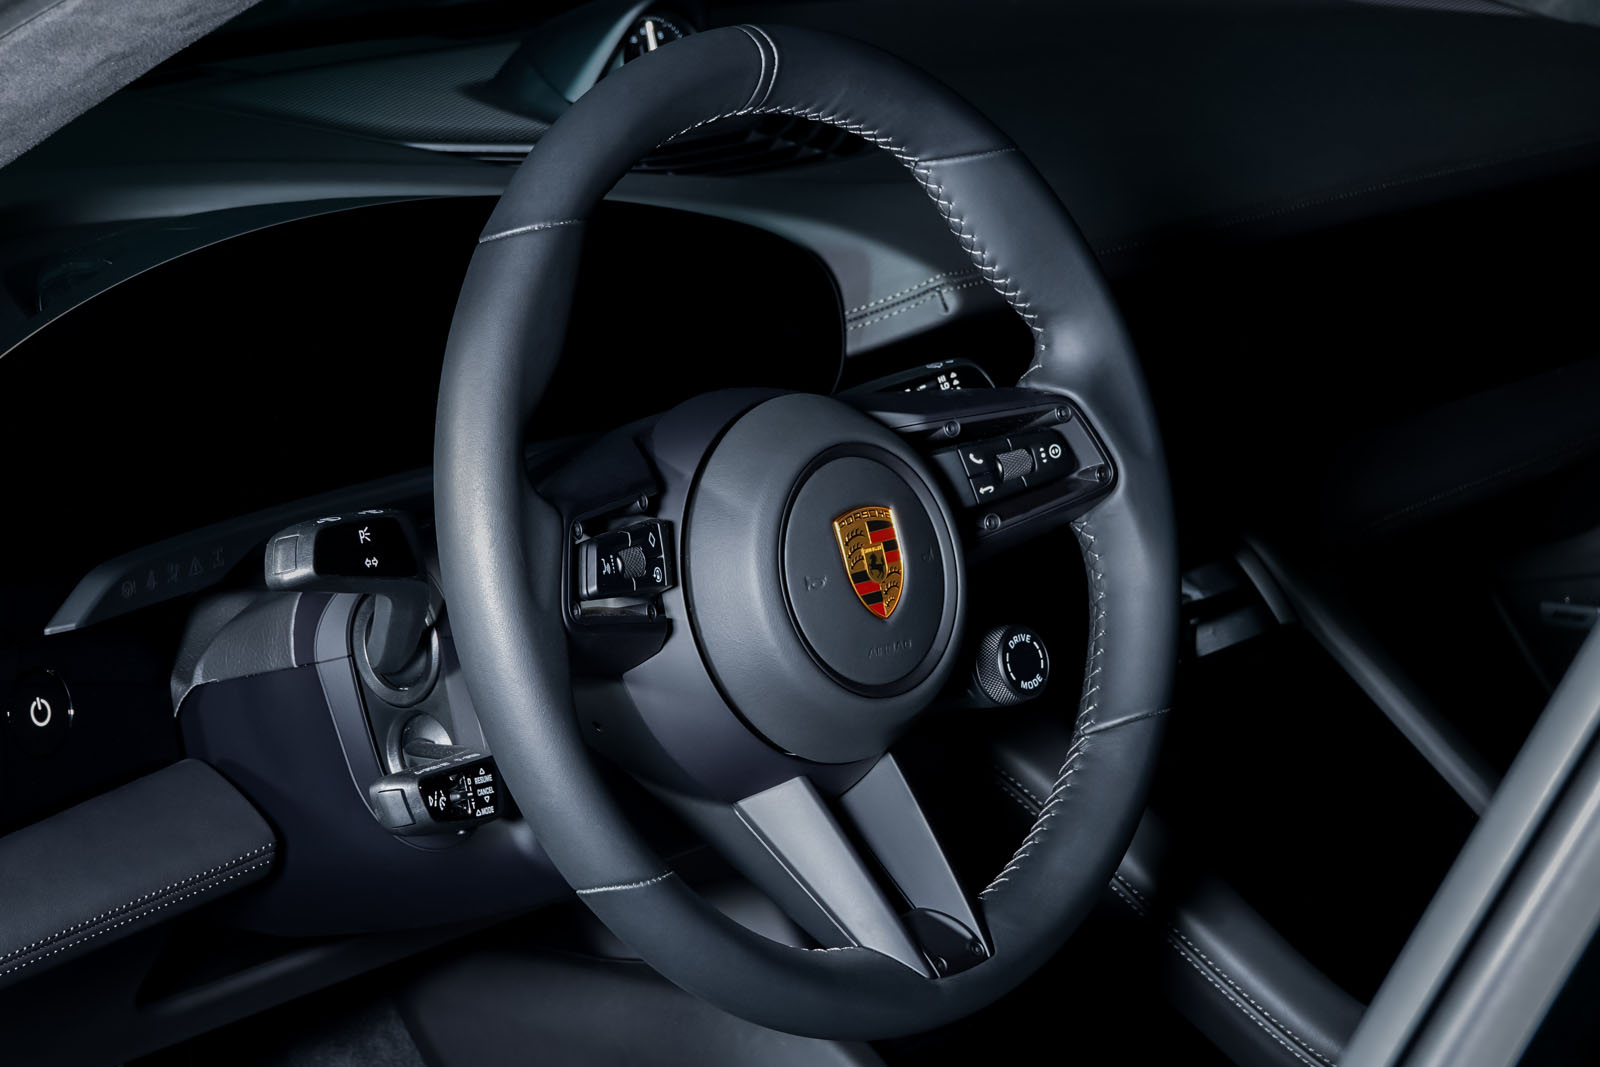 Porsche_Taycan_Turbo_Schwarz_Schwarz_POR-8106_9_w